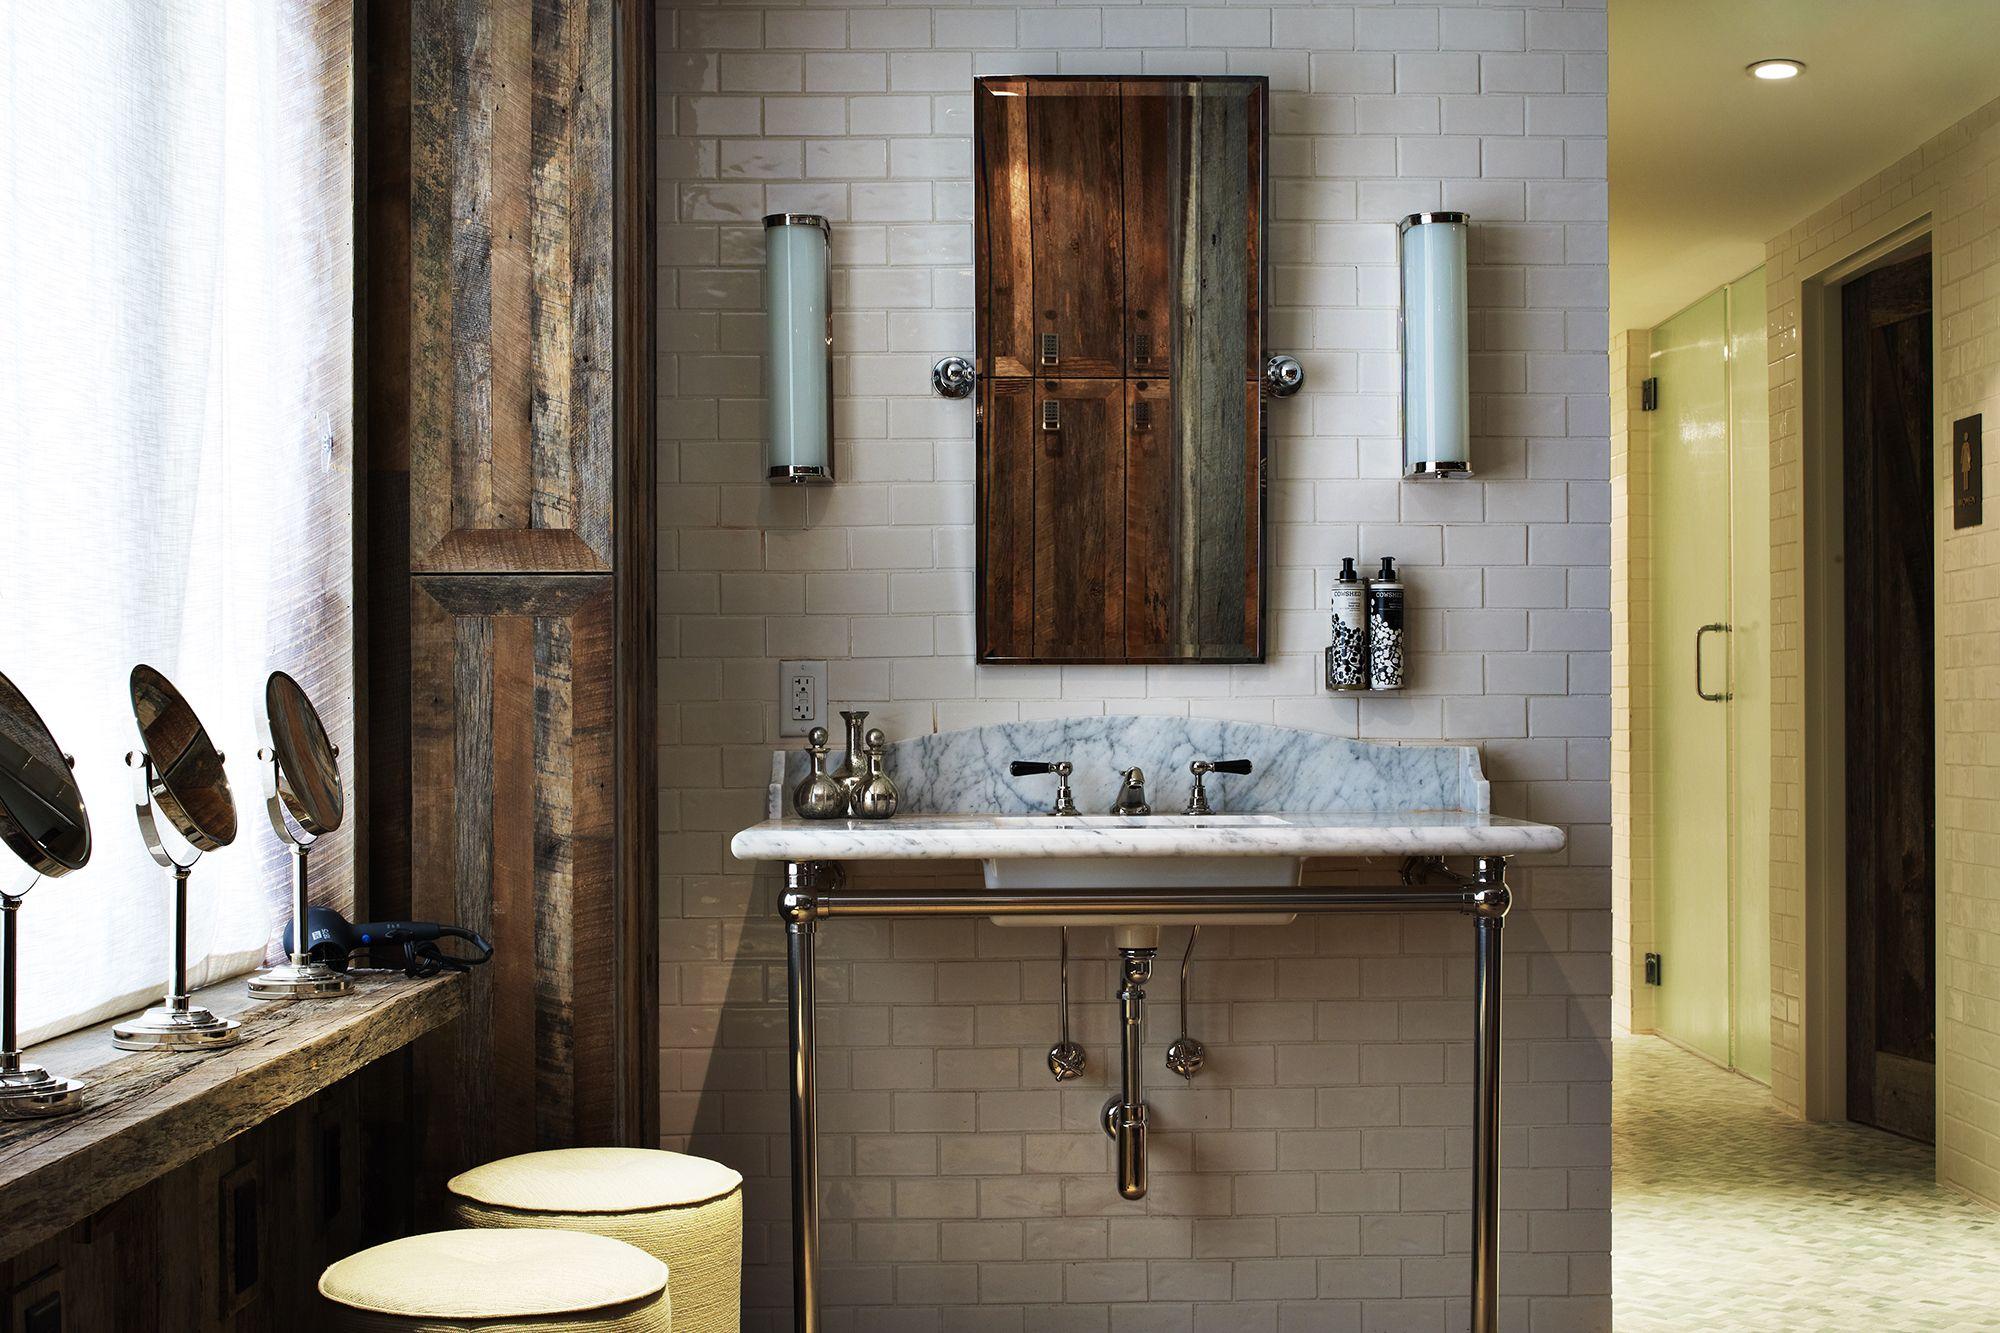 Treatment room by martin brudnizki design studio cowshed for Martin craig bathroom design studio